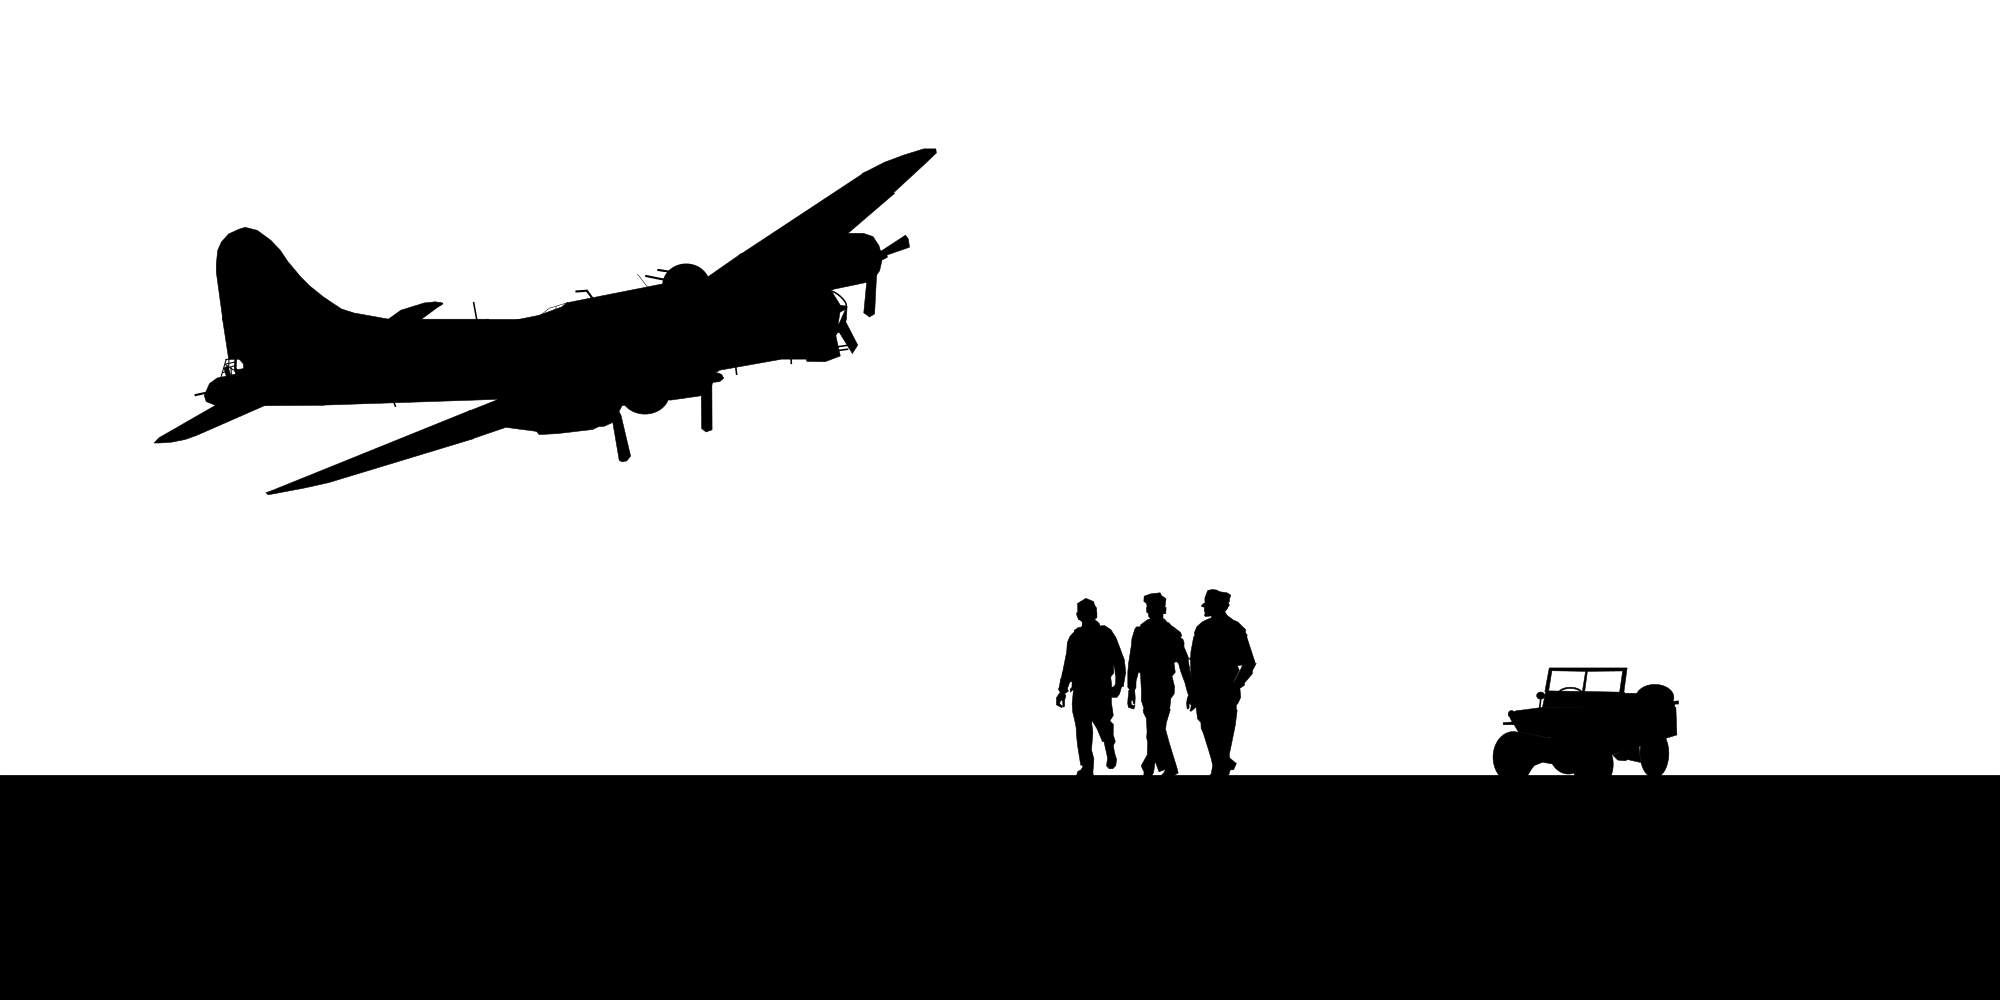 Panel Bottom 09